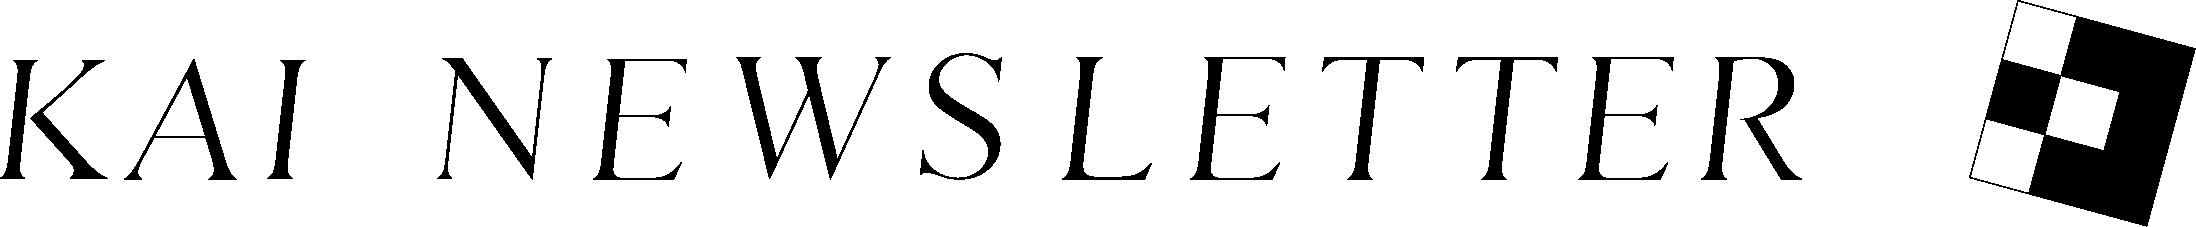 KAINEWSLETTER